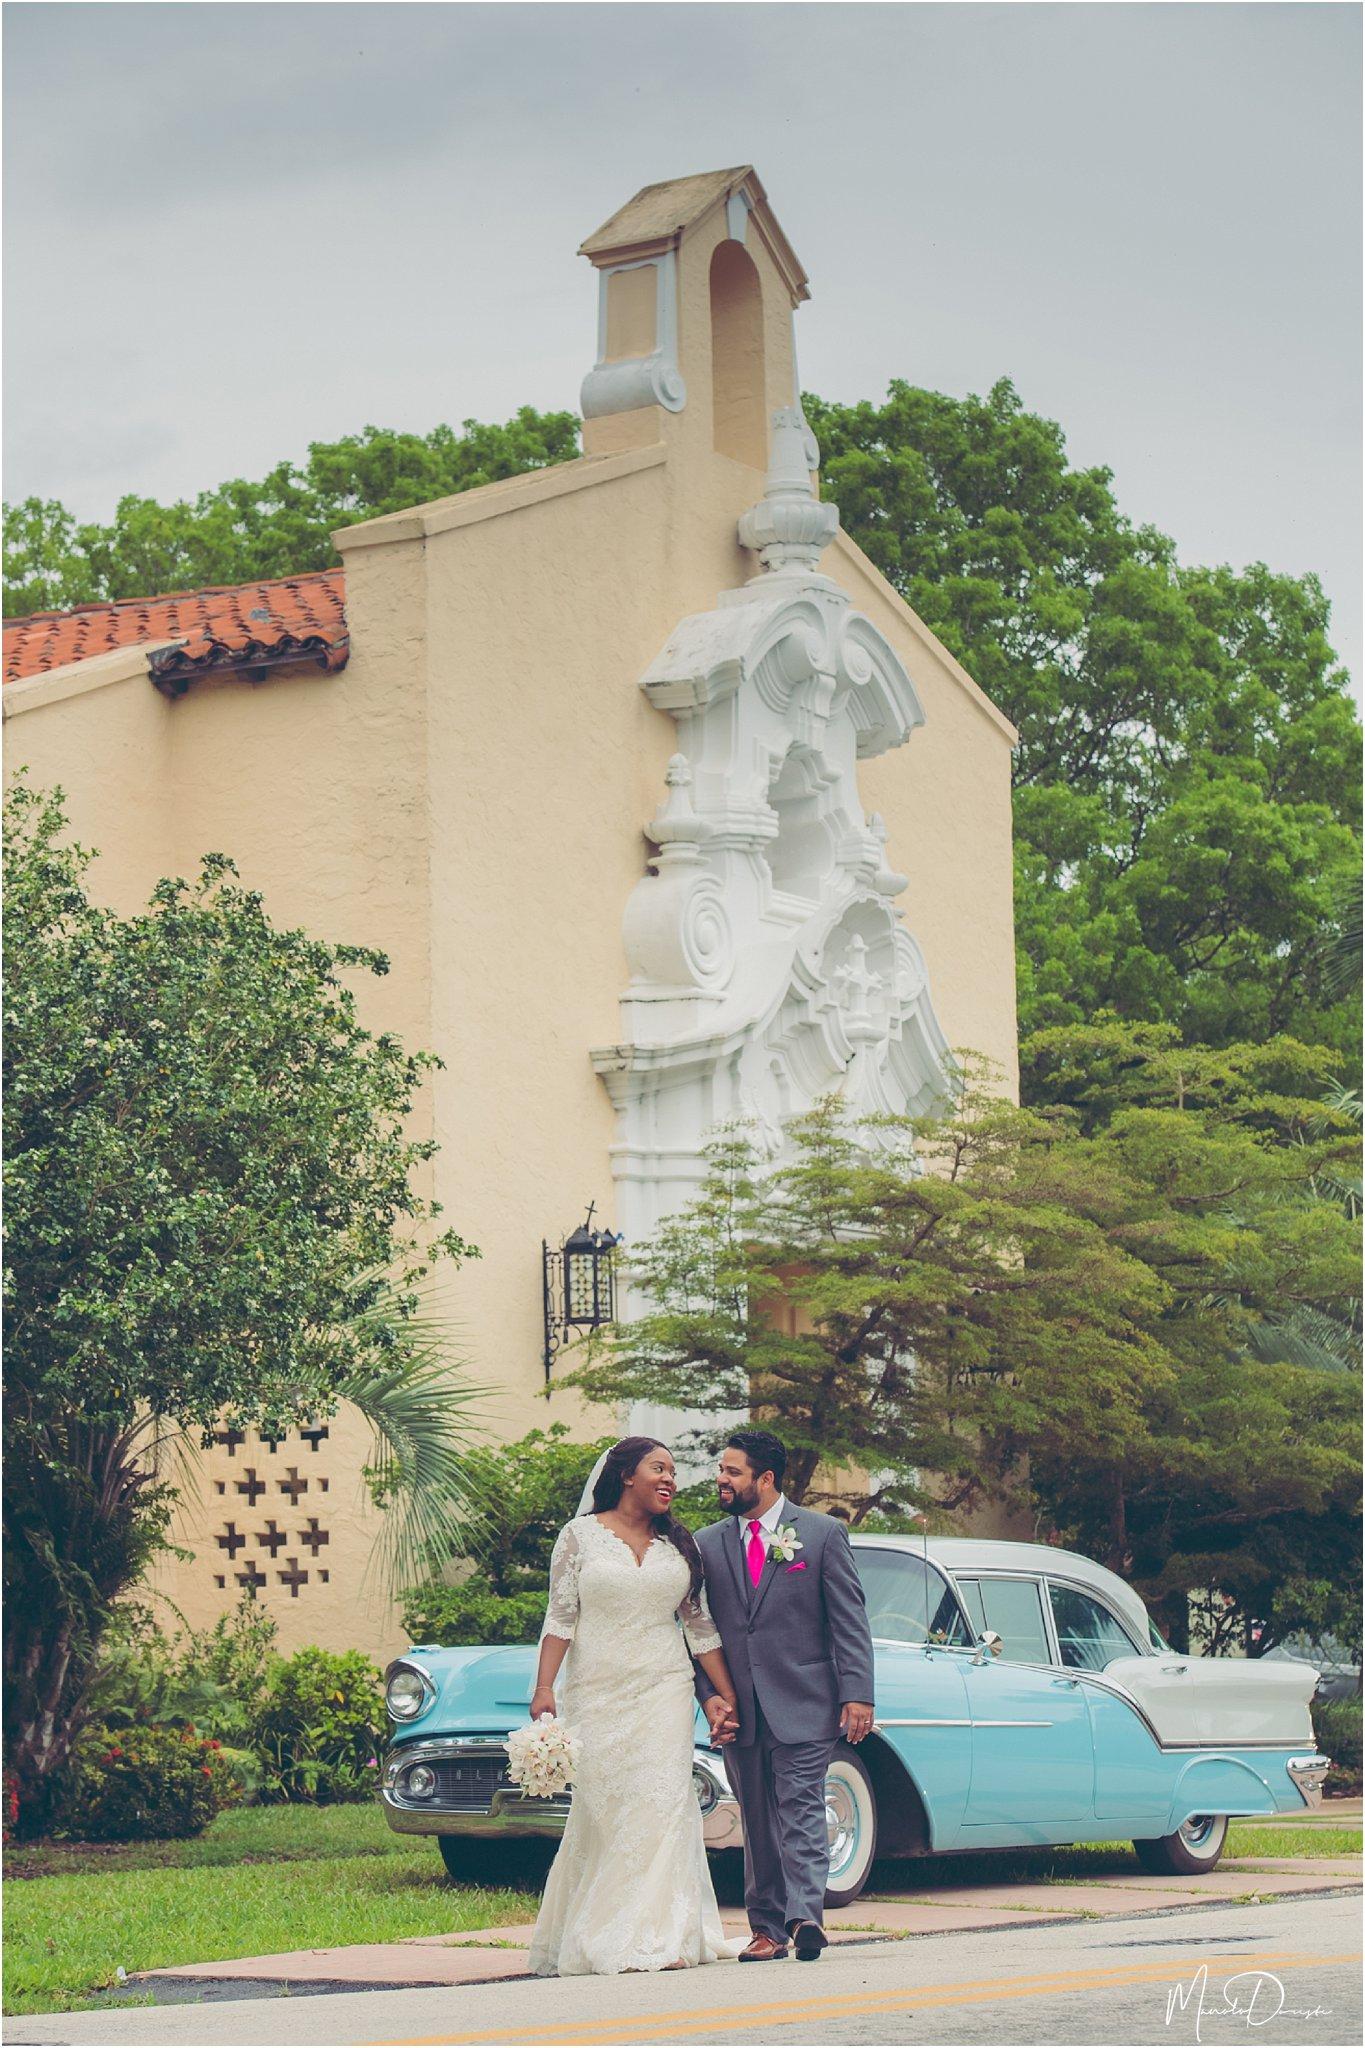 0427_ManoloDoreste_InFocusStudios_Wedding_Family_Photography_Miami_MiamiPhotographer.jpg